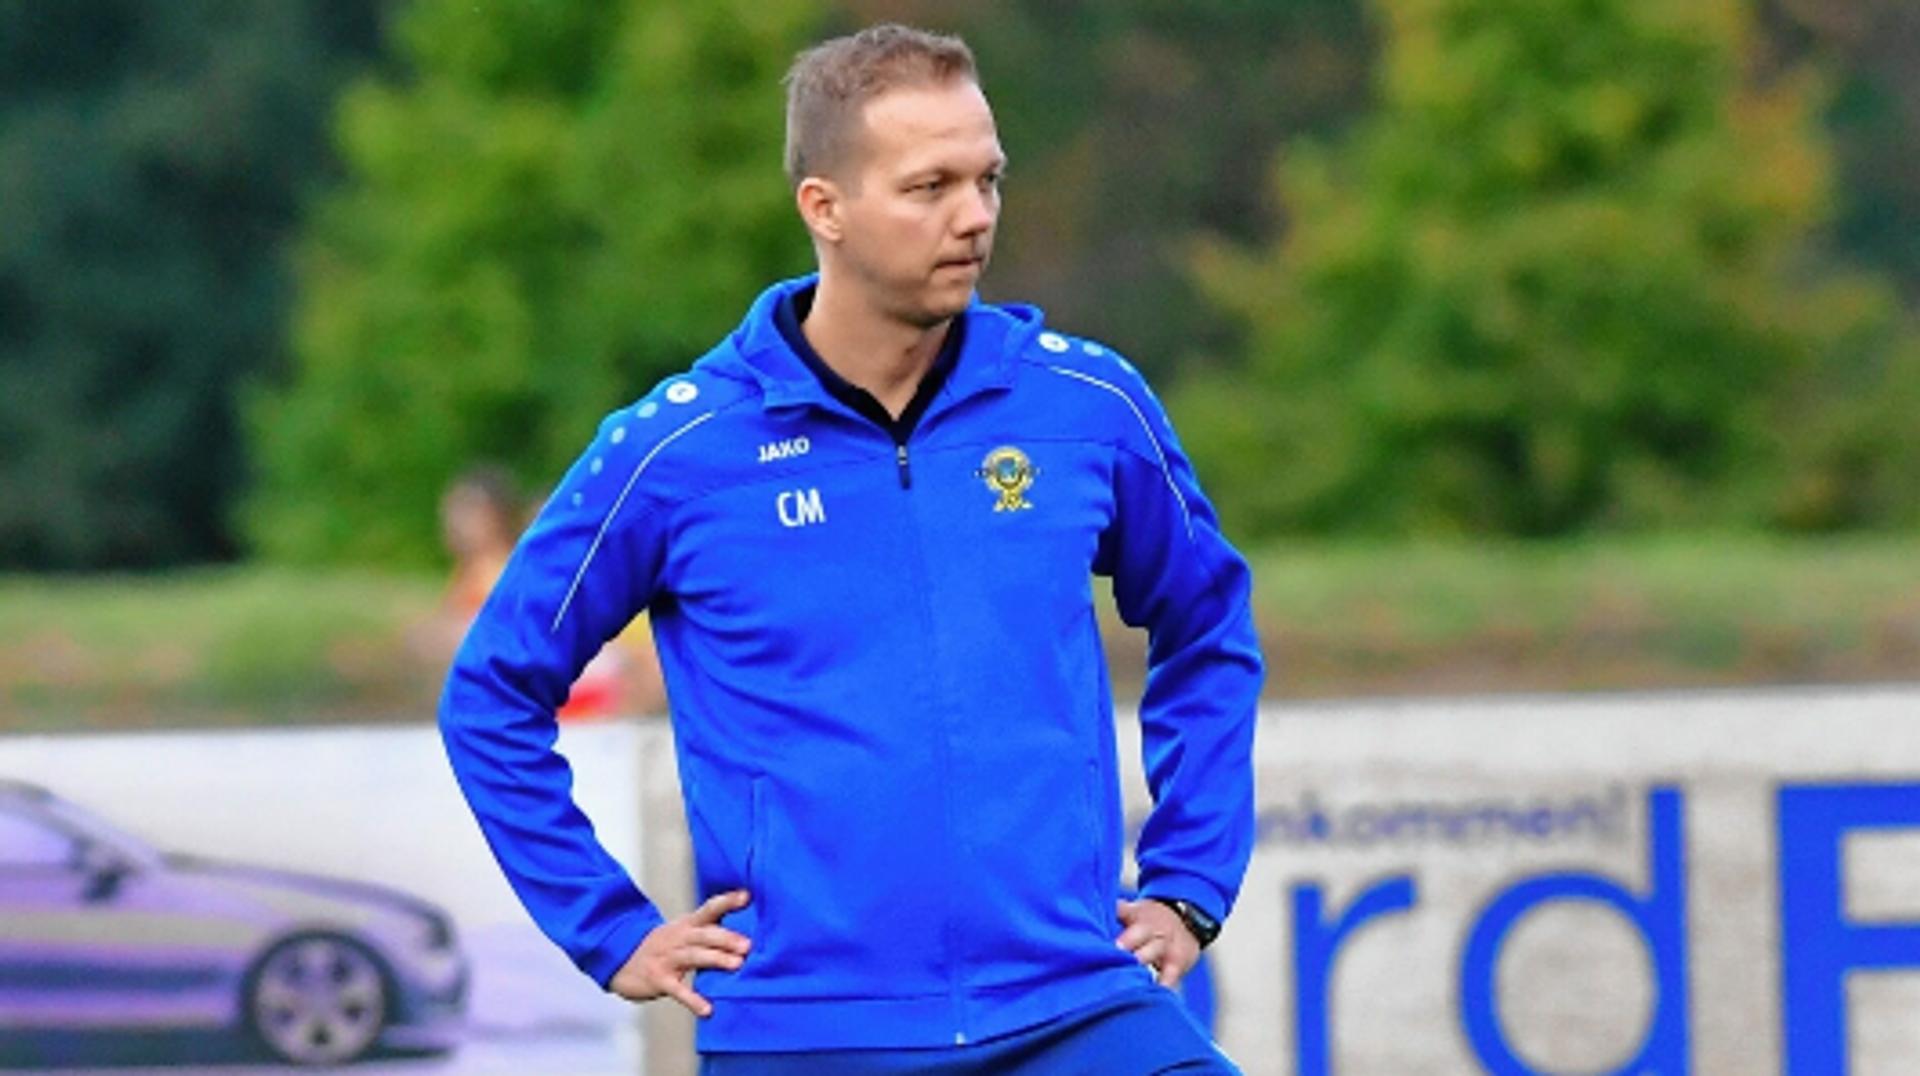 DSC-Coach Christoph Meier